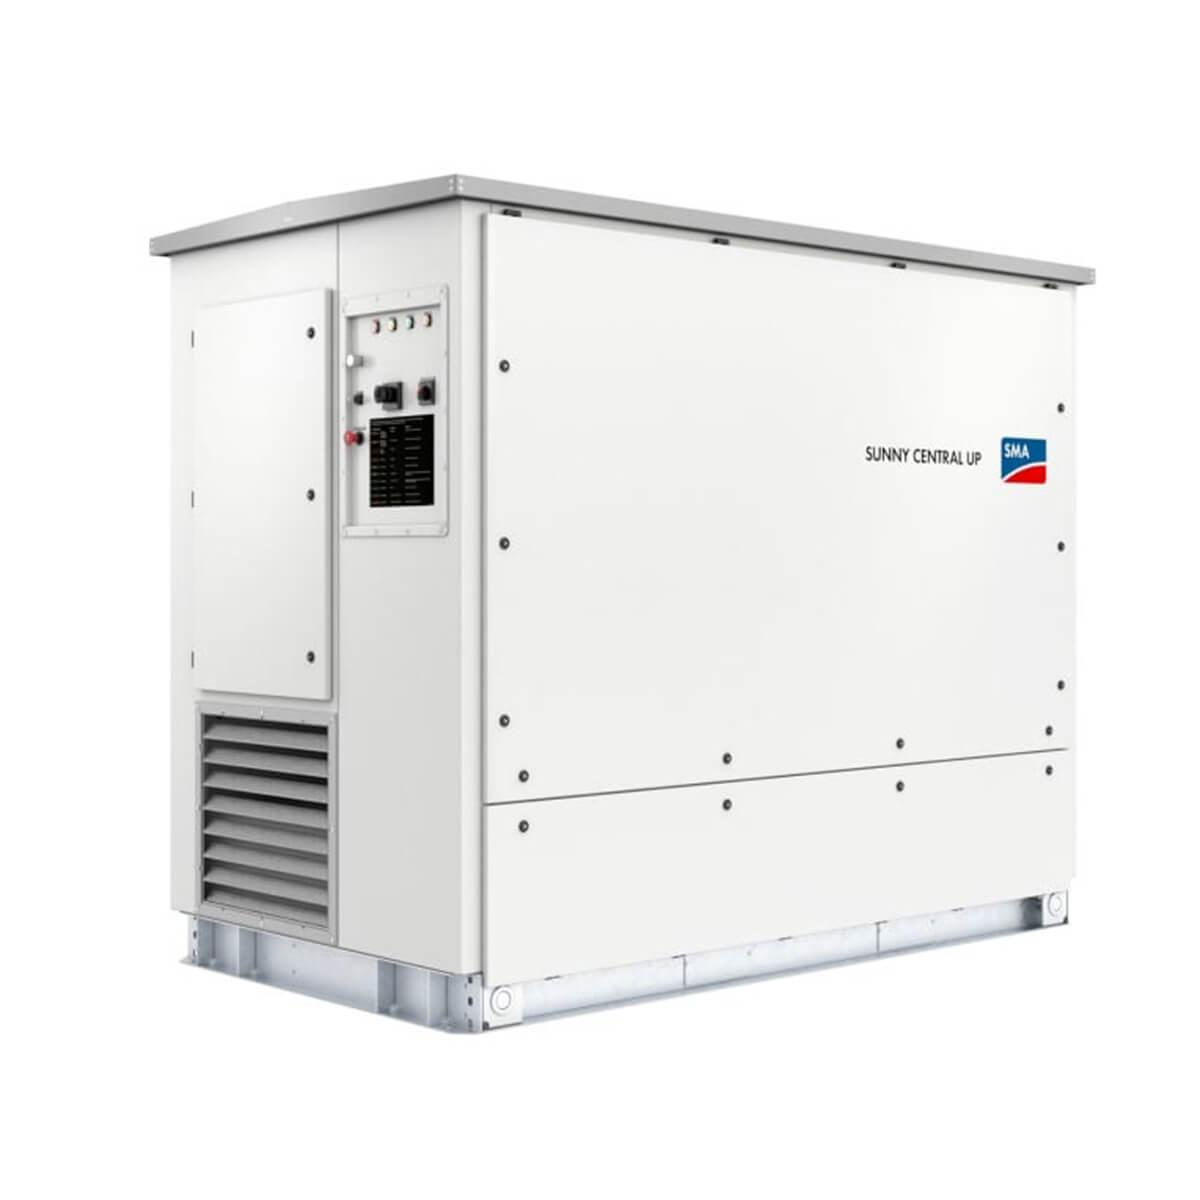 sma 4400kW inverter, sma sunny central 4400kW inverter, sma sunny central 4400 up inverter, sma sunny central 4400 up, sma sunny central 4400 kW, SMA 4400KW